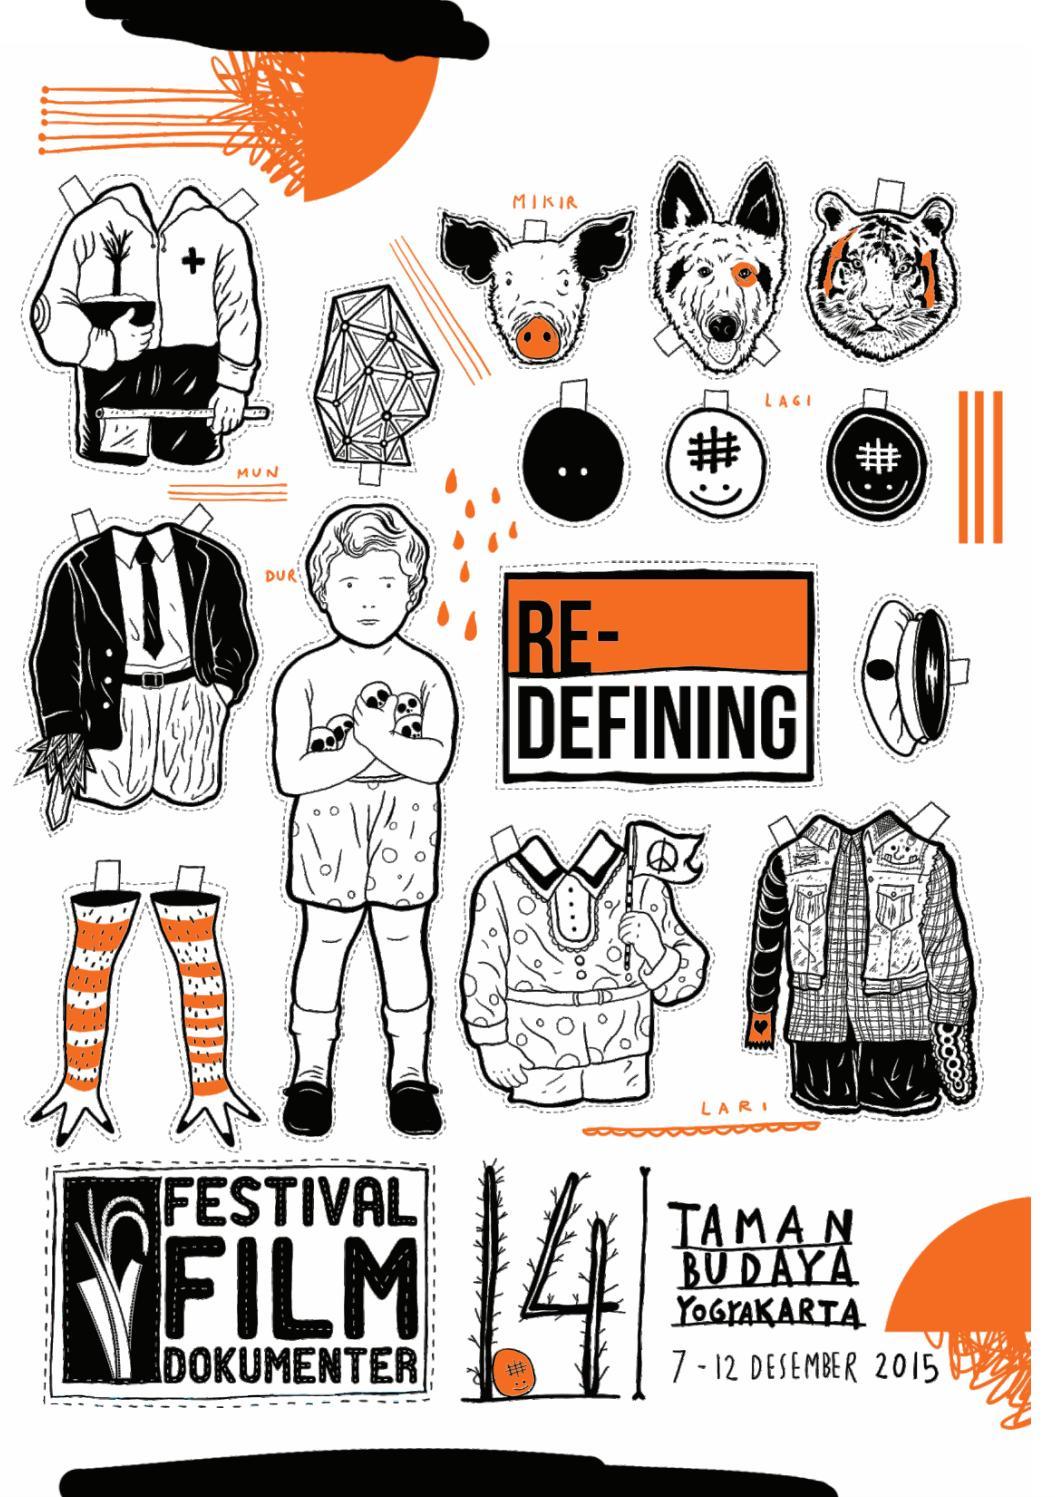 Ffd 2015 Program Book By Festival Film Dokumenter Issuu